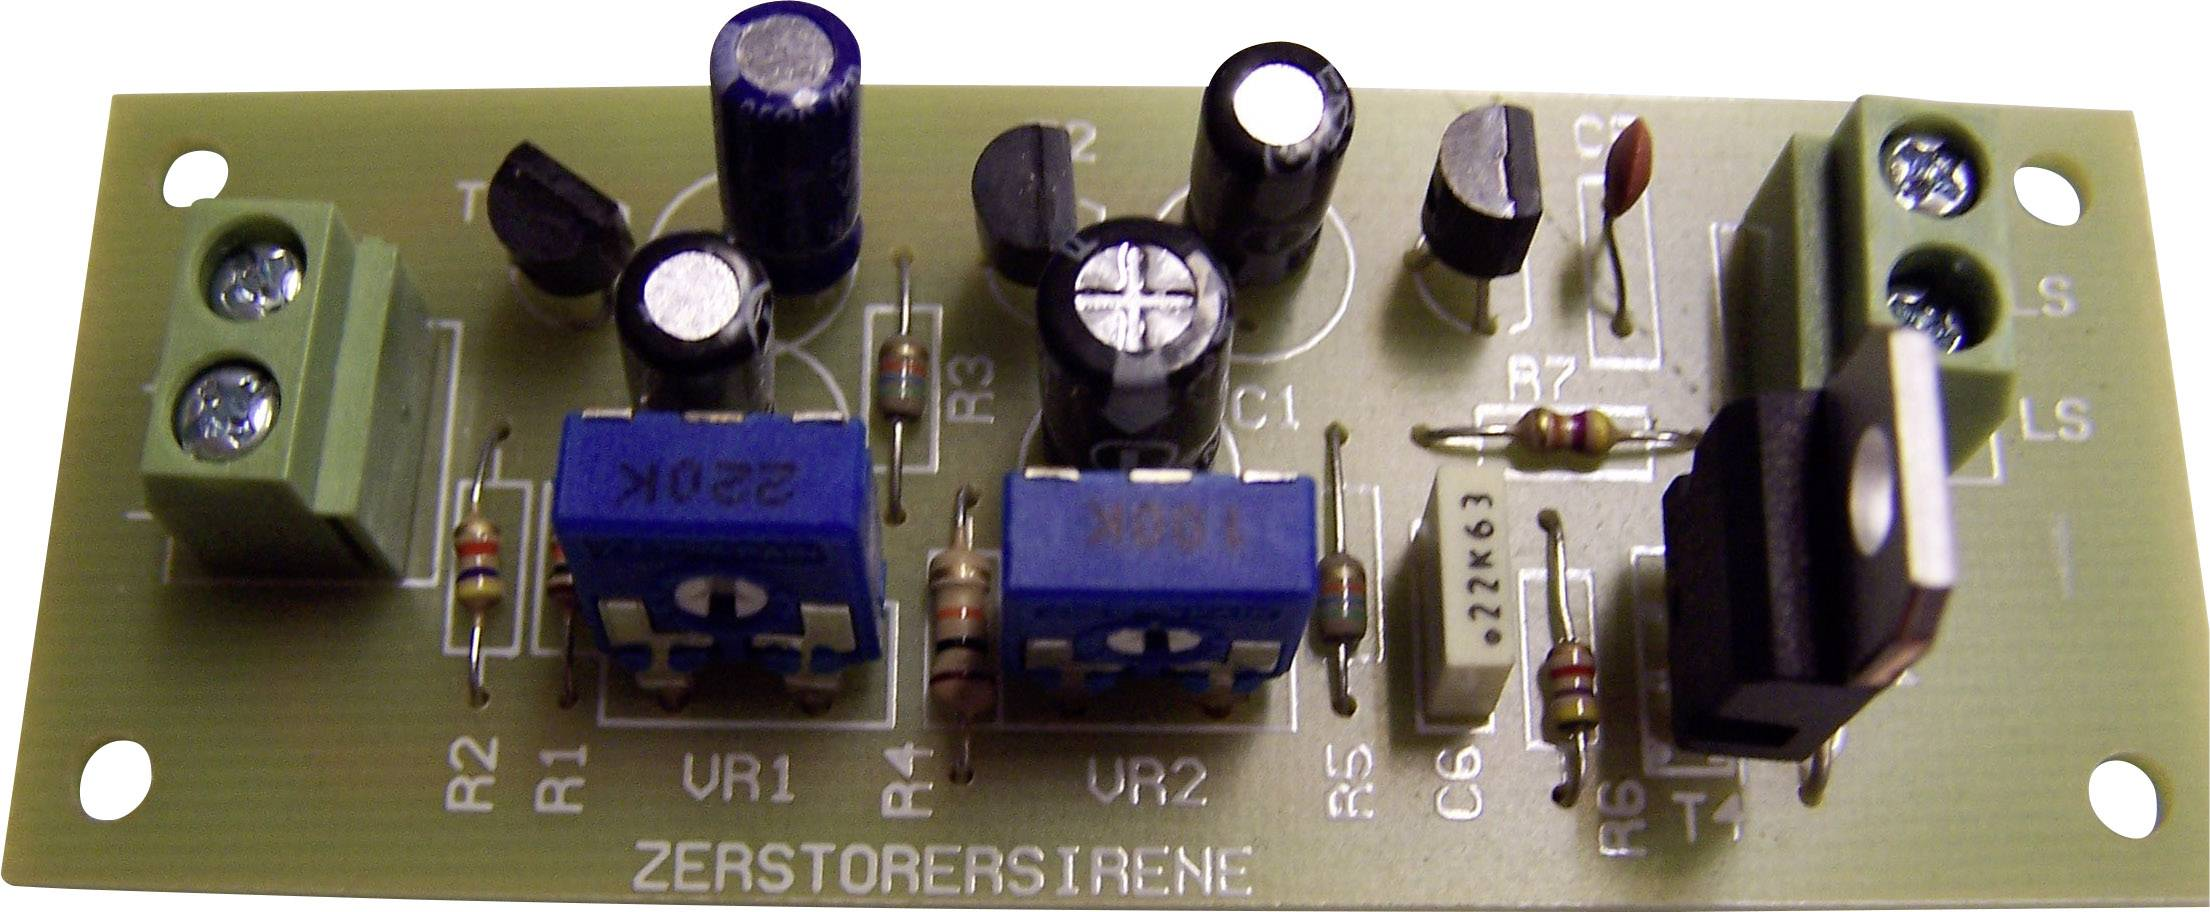 Audio modul 190900, 6 - 12 V